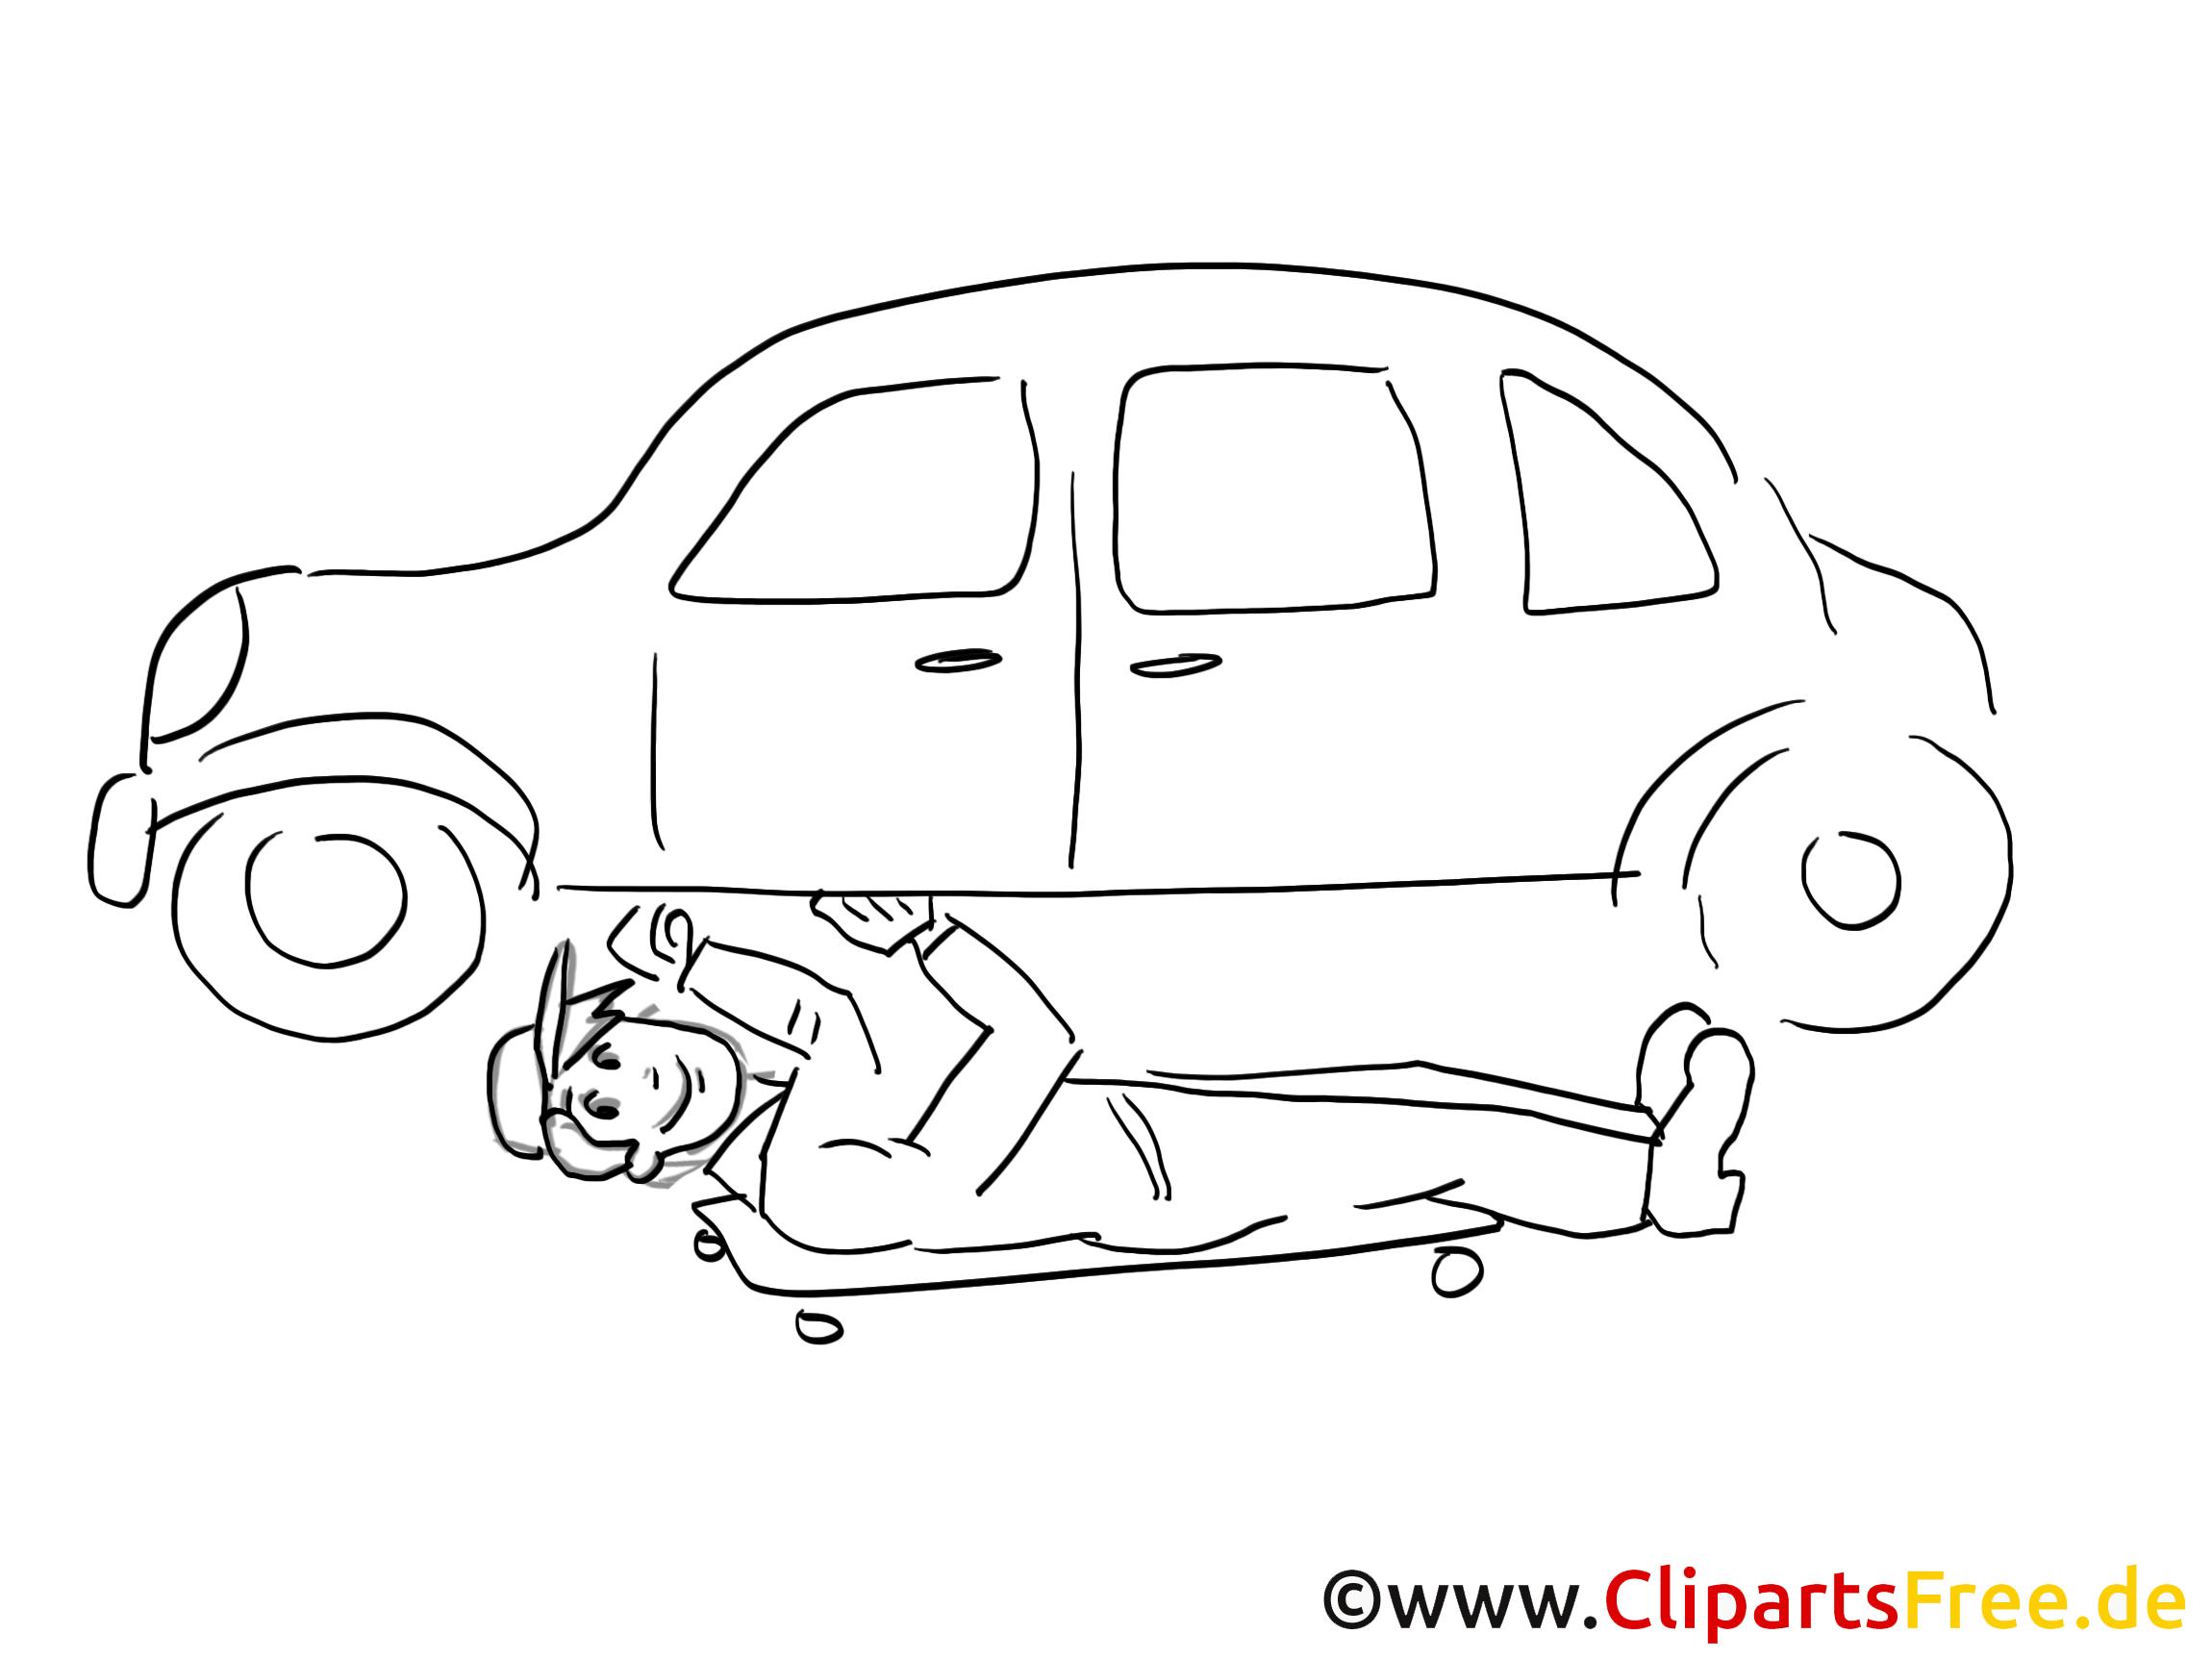 Mechanician clip art, graphic, pic, cartoon, comic free